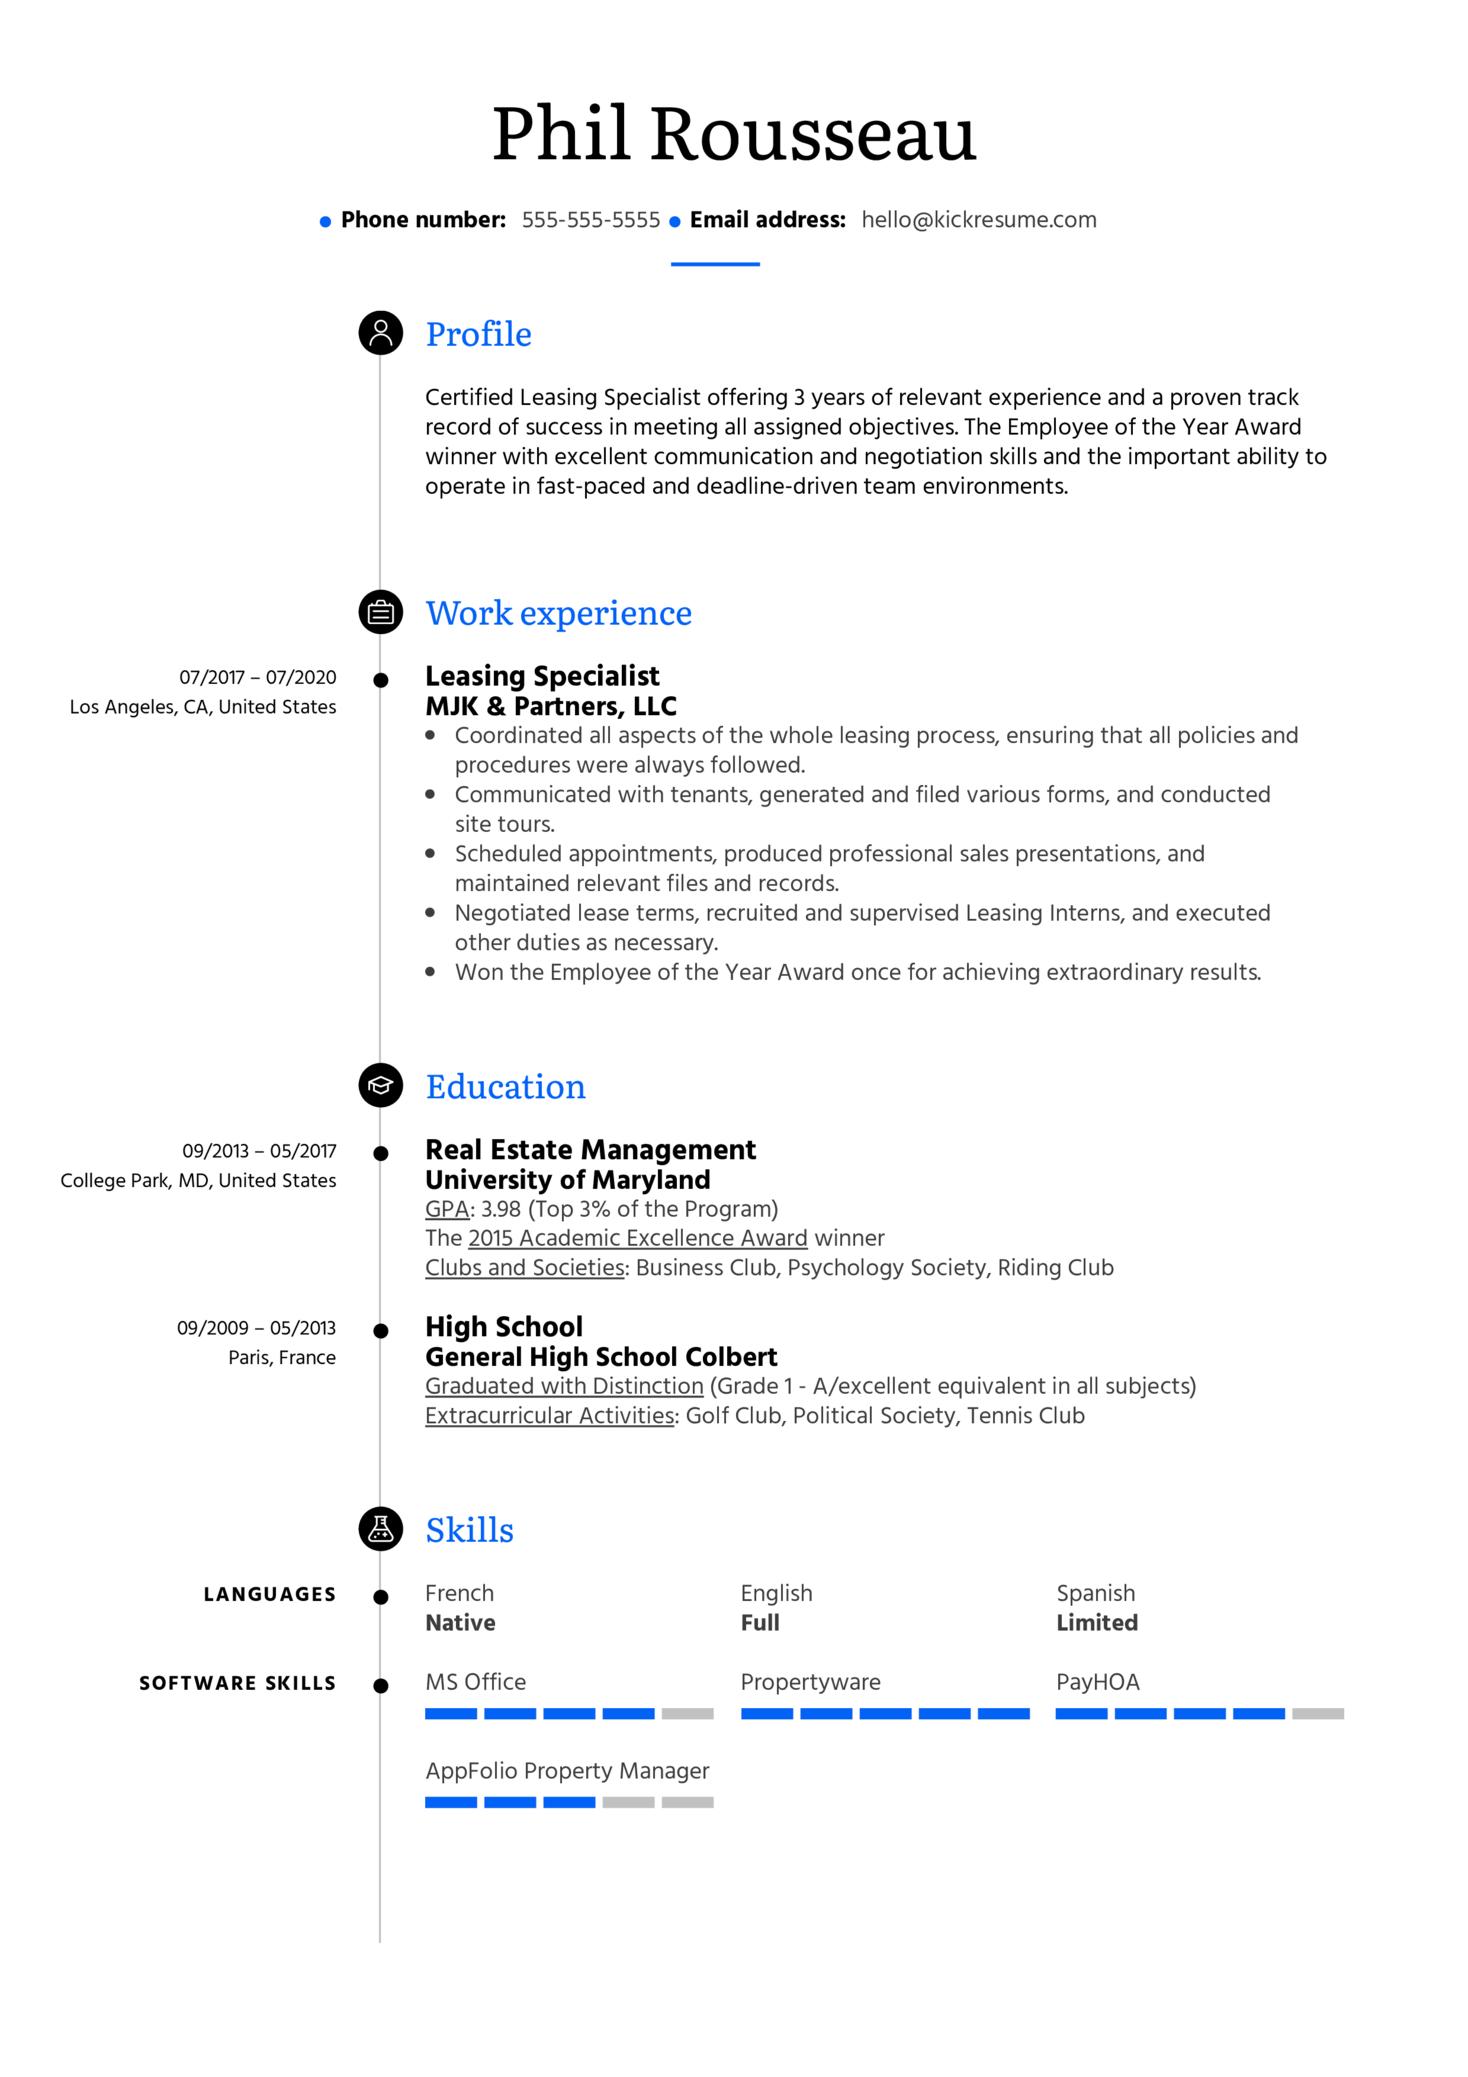 Leasing Specialist Resume Example (parte 1)